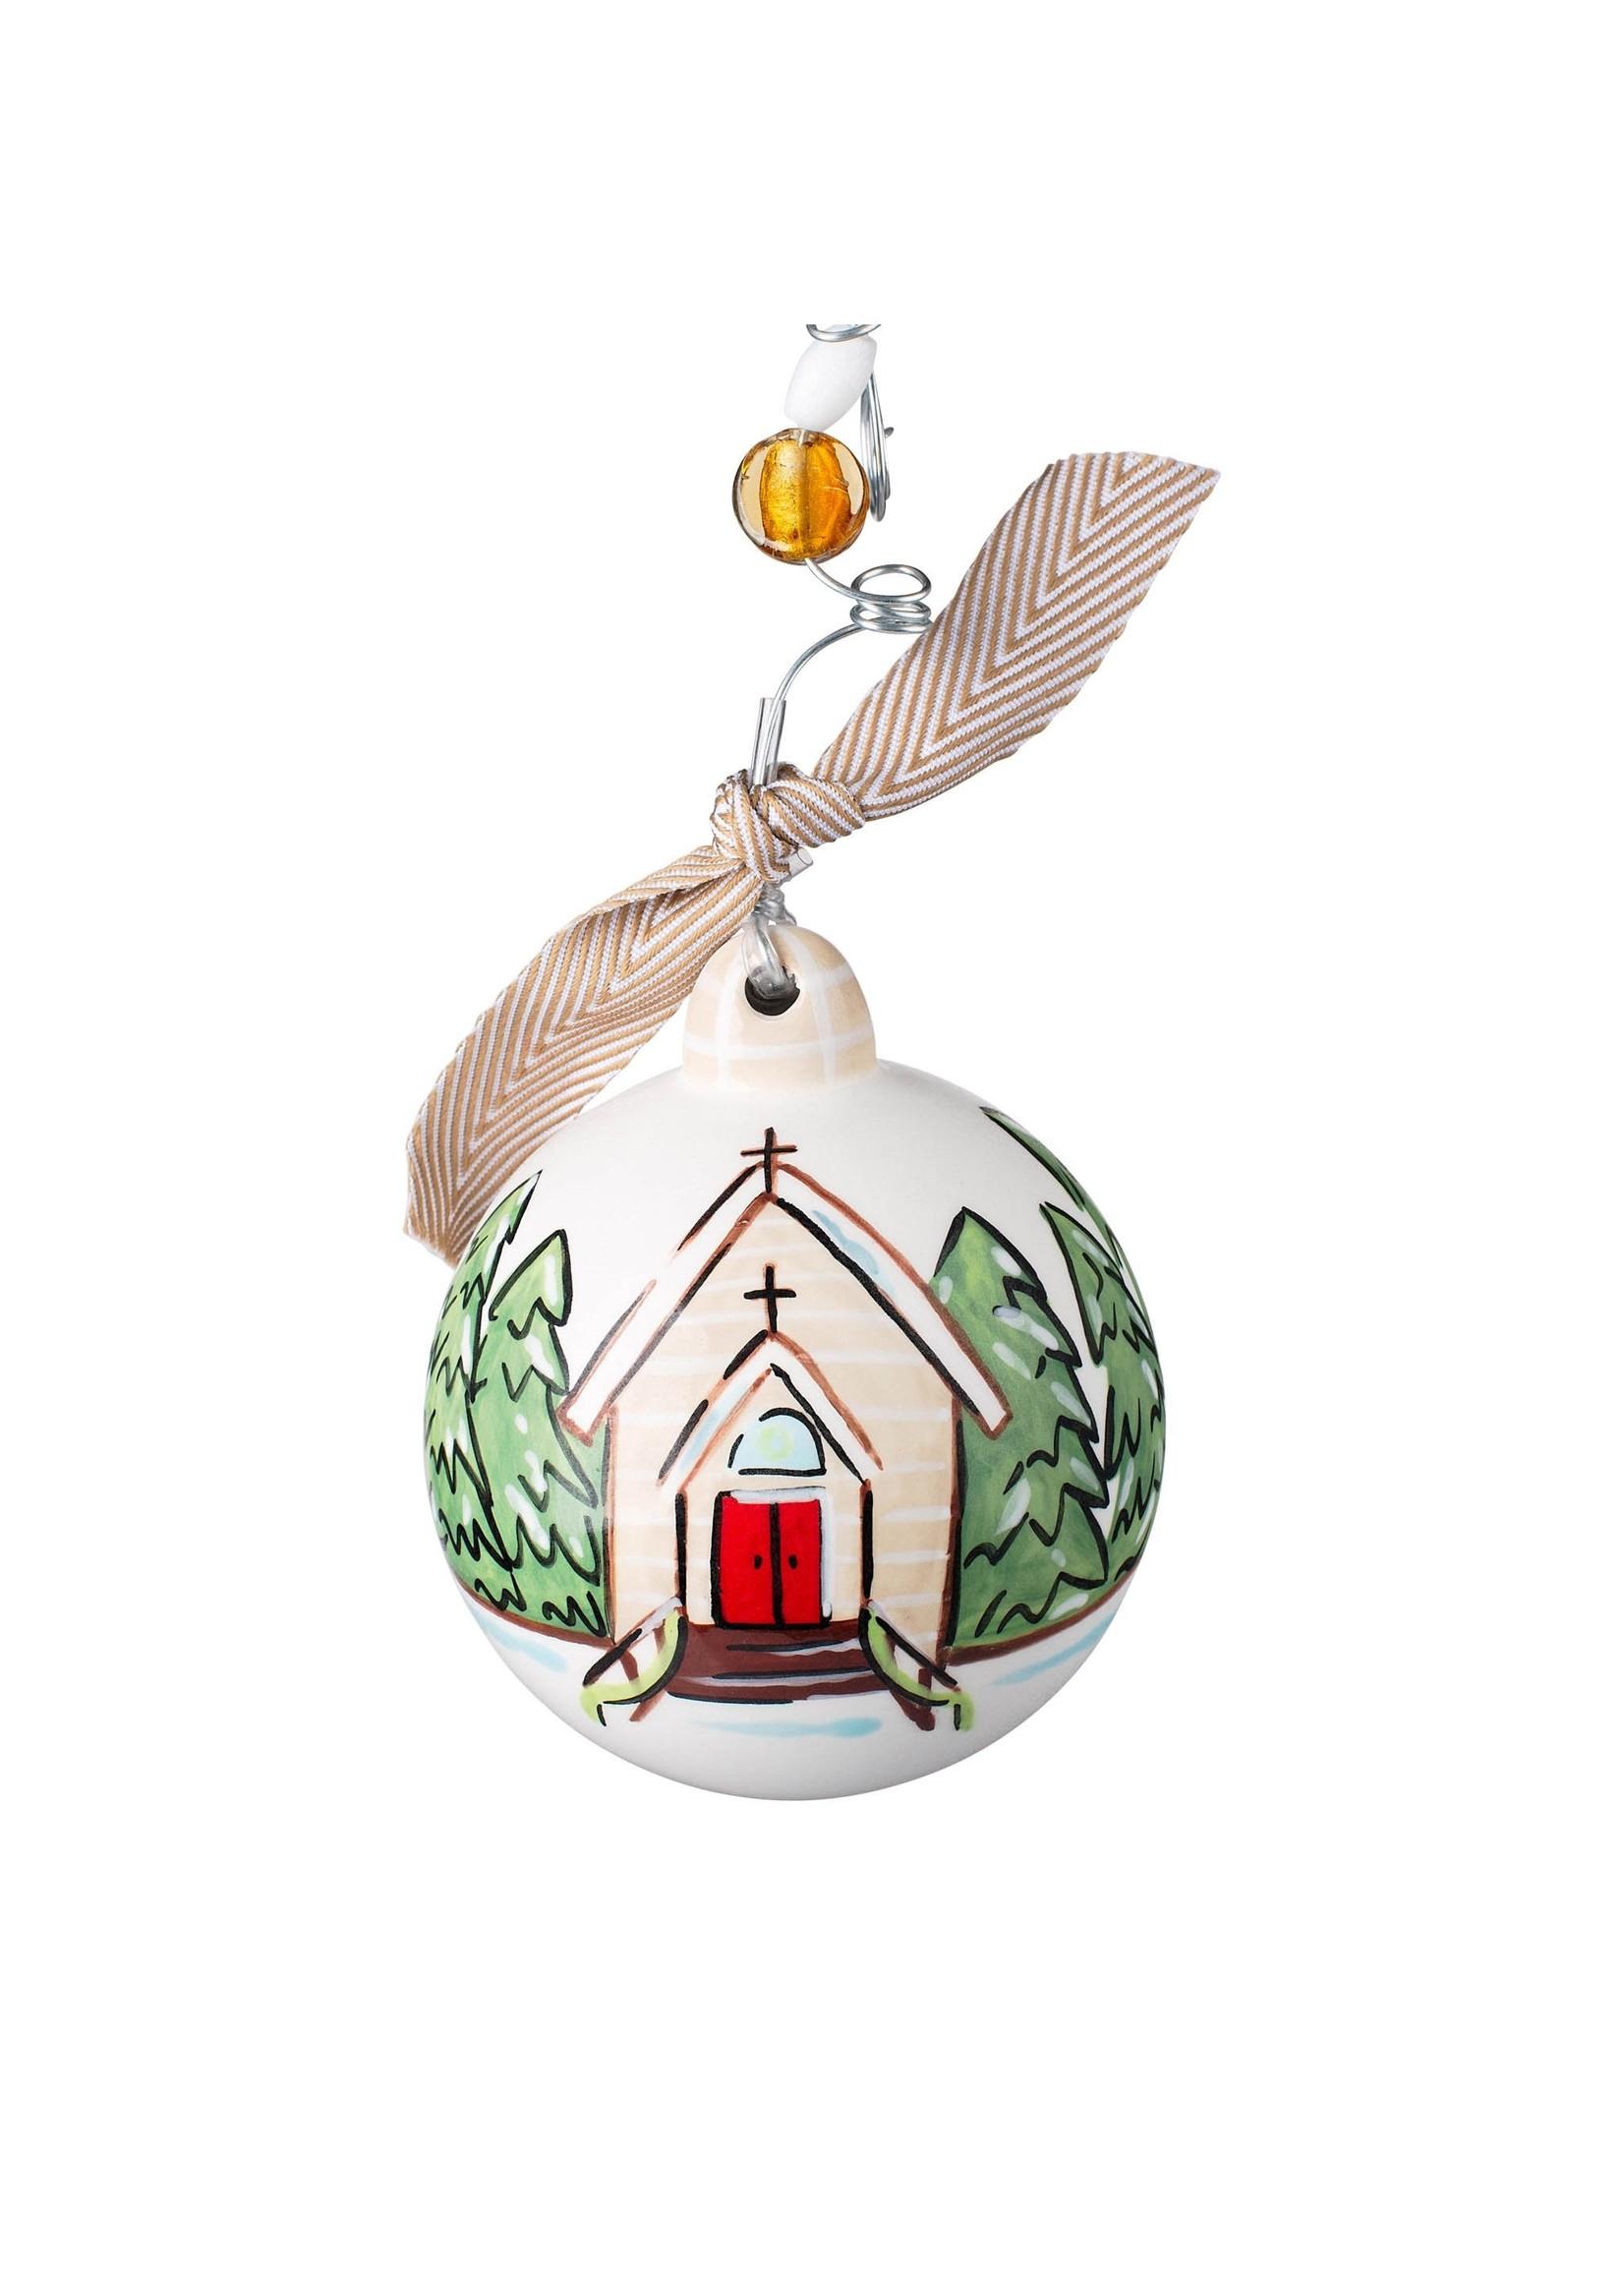 Church Let Us Adore Him Ornament